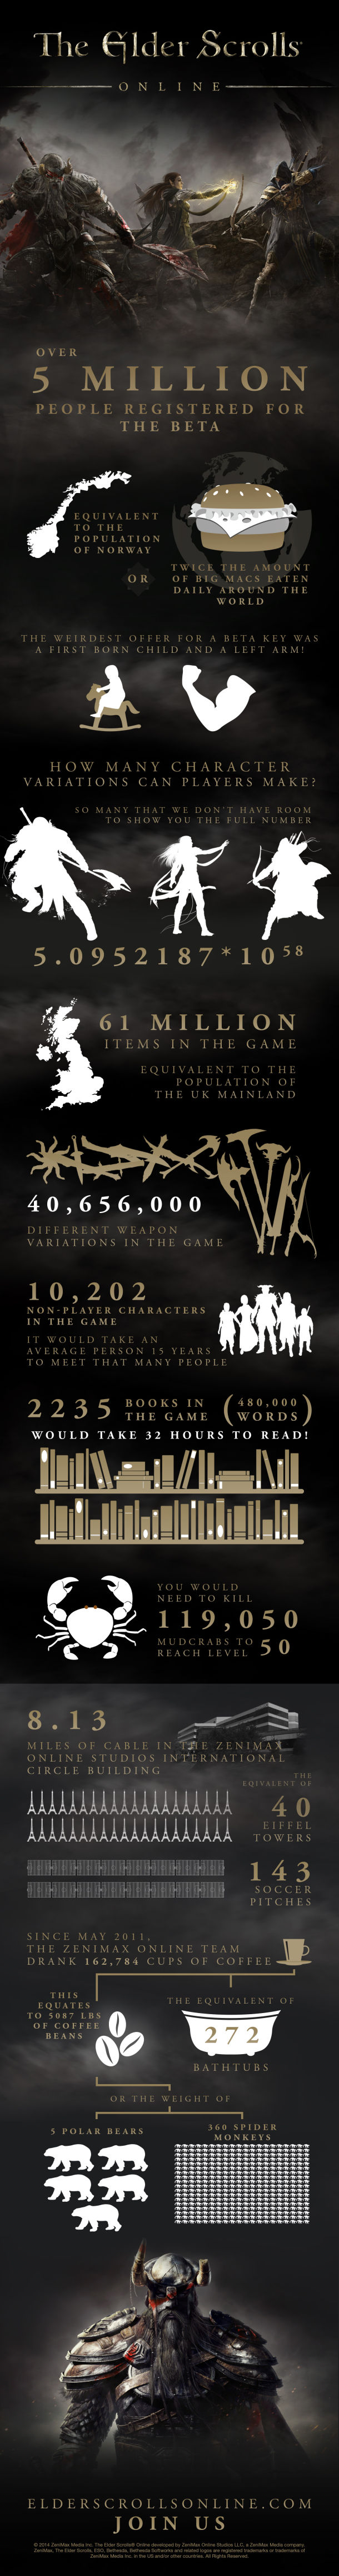 eso_infographic